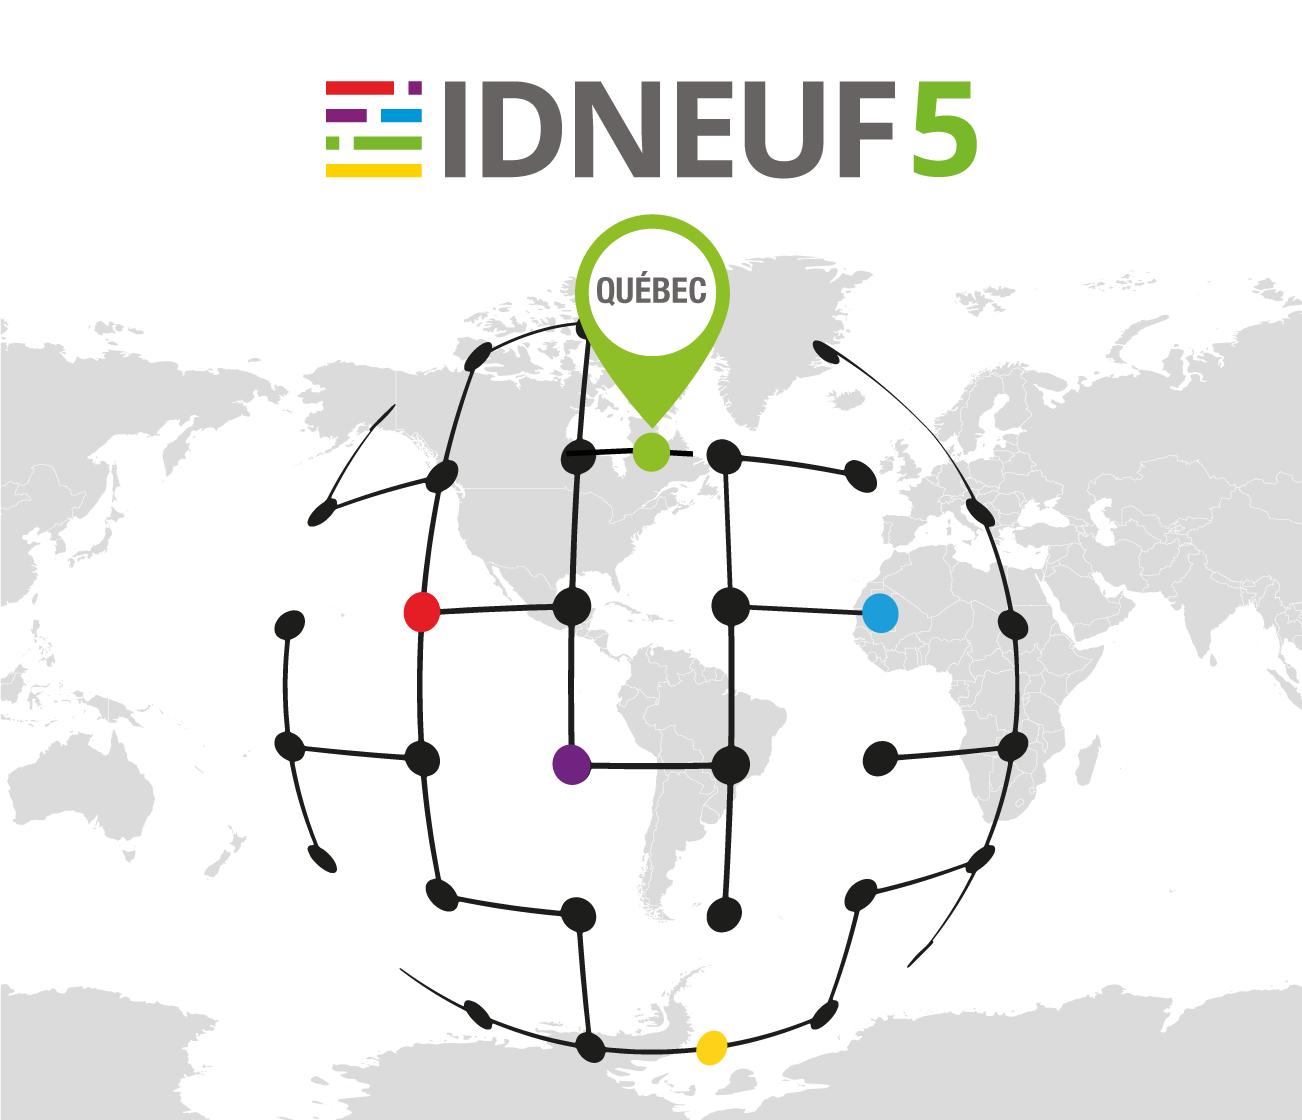 IDNEUF5